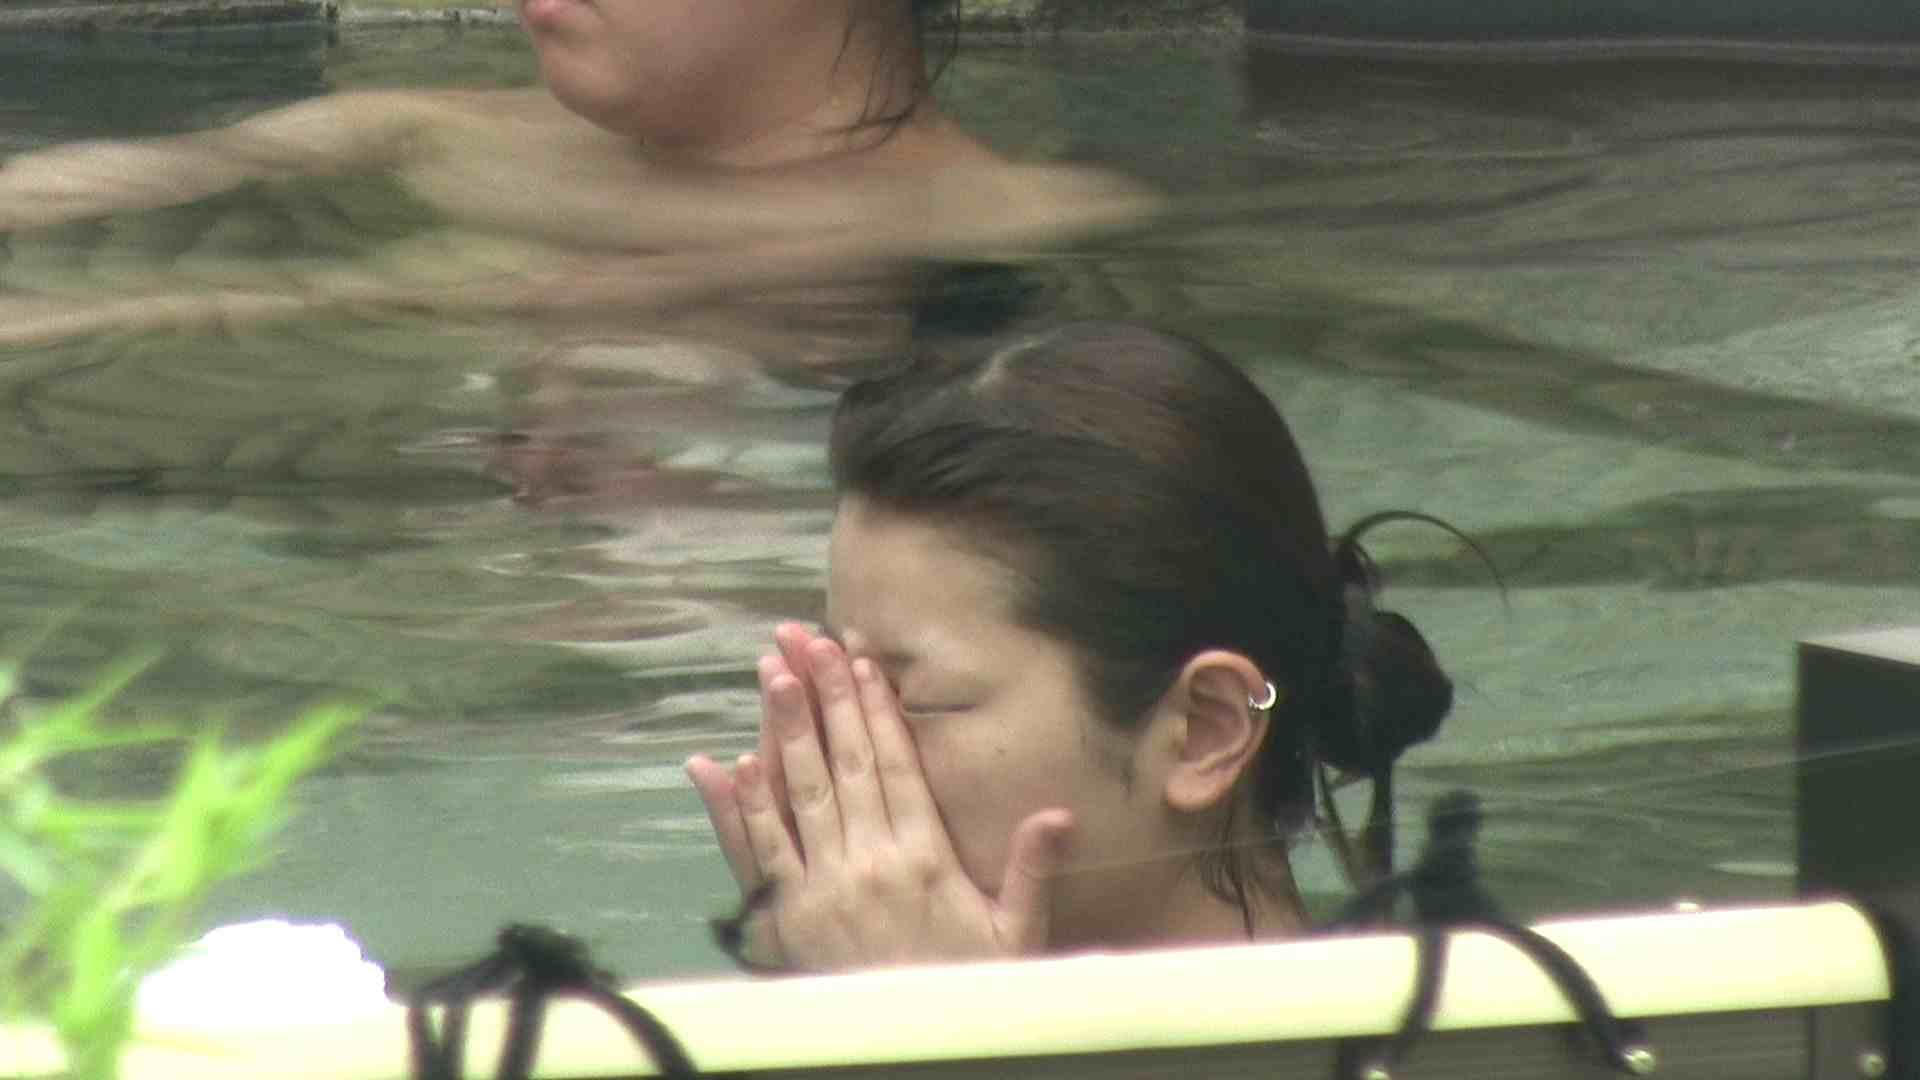 Aquaな露天風呂Vol.19【VIP】 盗撮 | HなOL  88pic 66